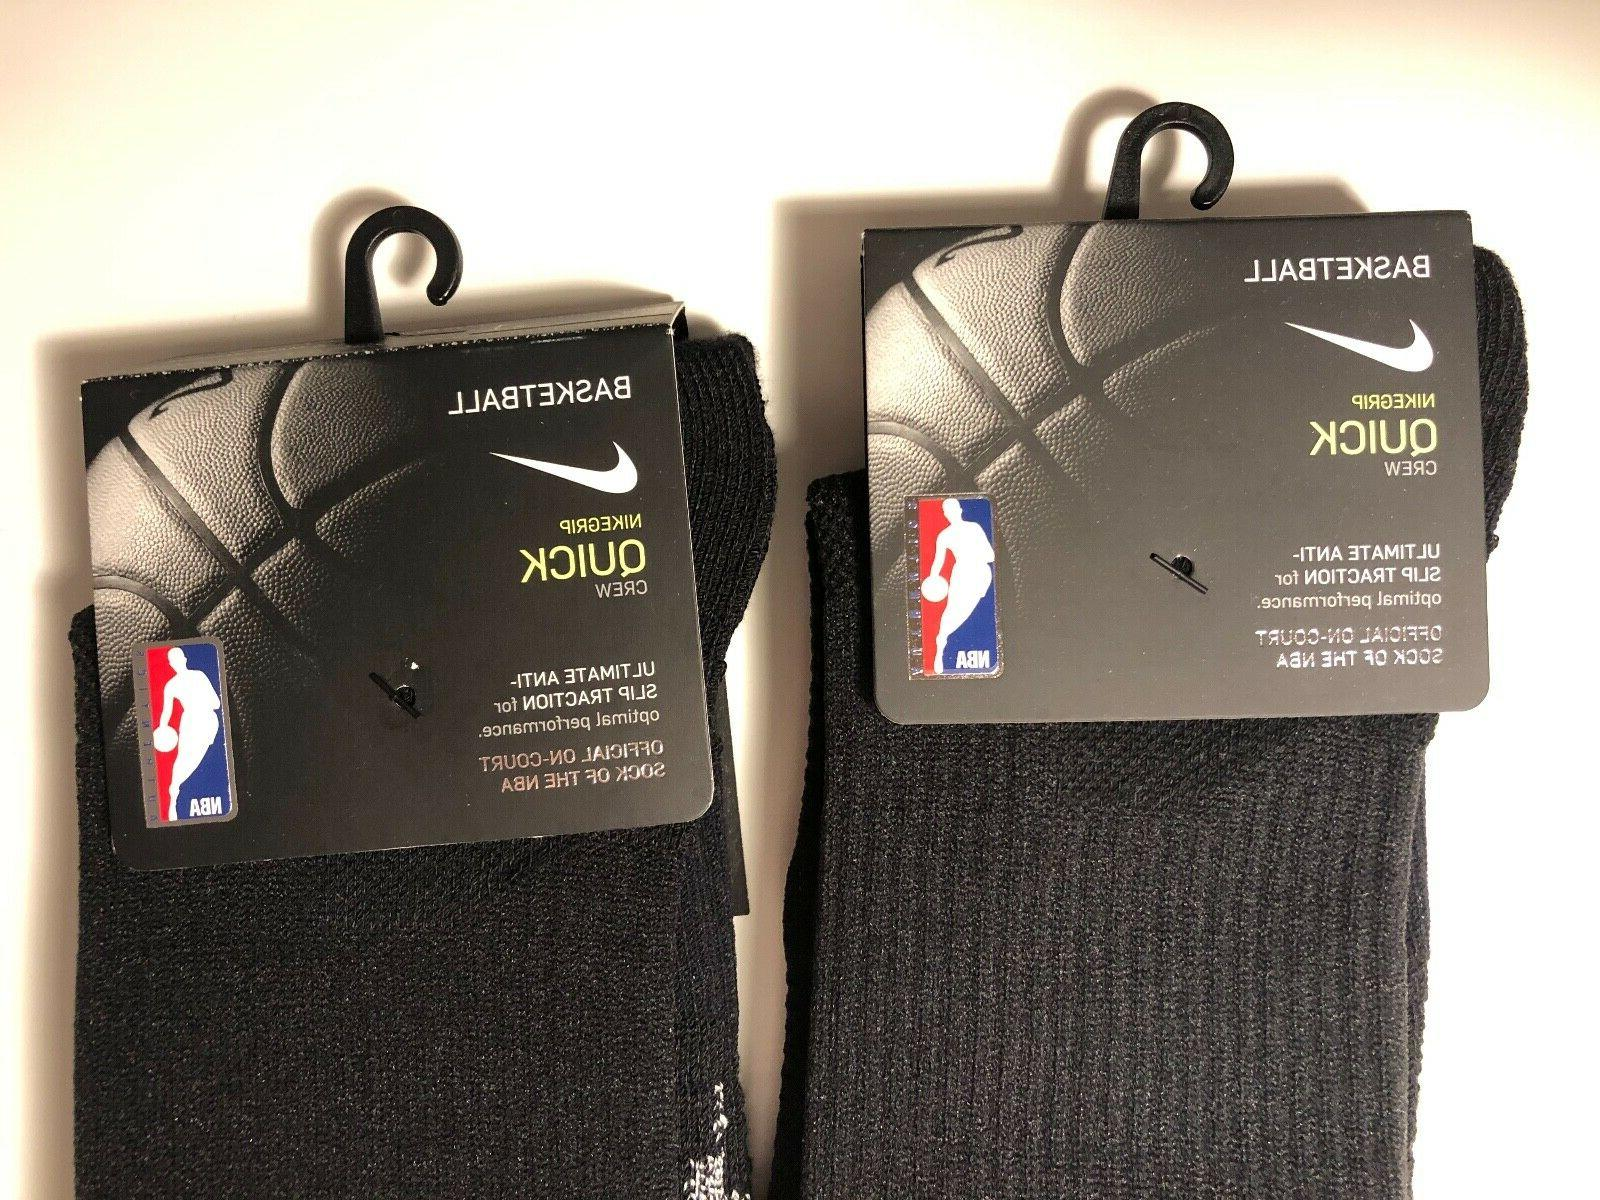 2 of NikeGrip NBA Basketball Socks